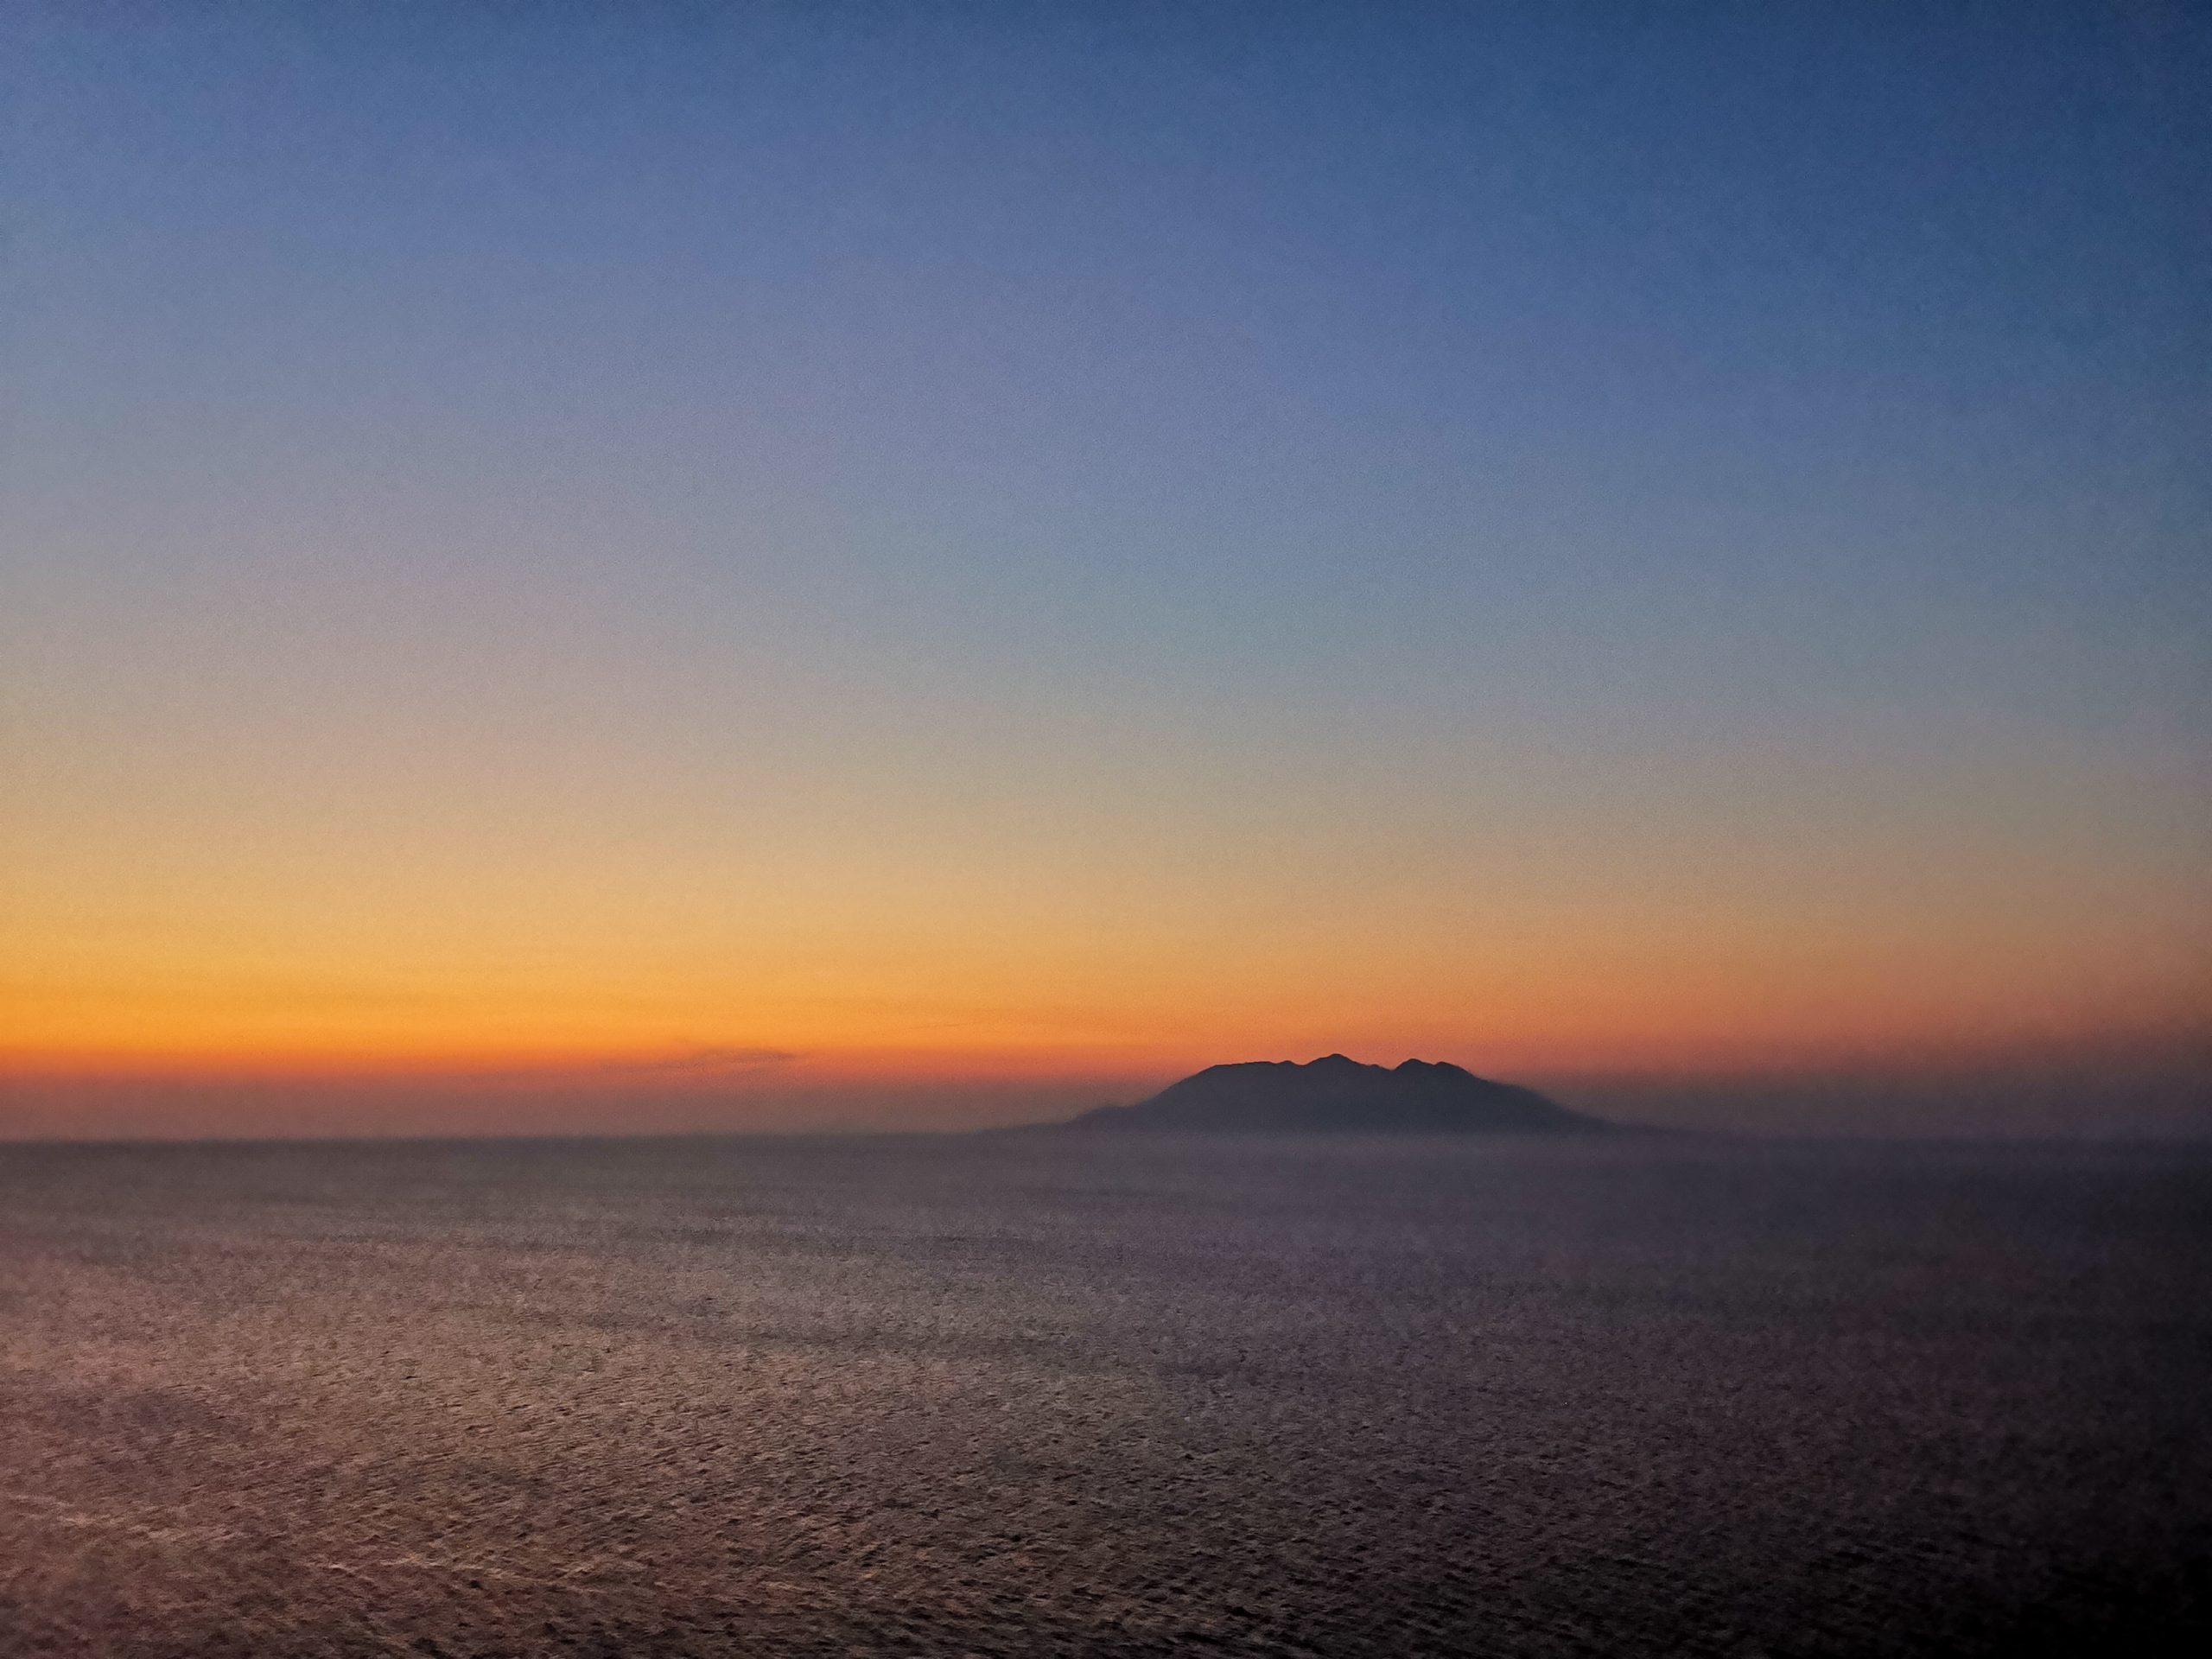 View to Greek island Samothrace from Poseidon Imroz restaurant